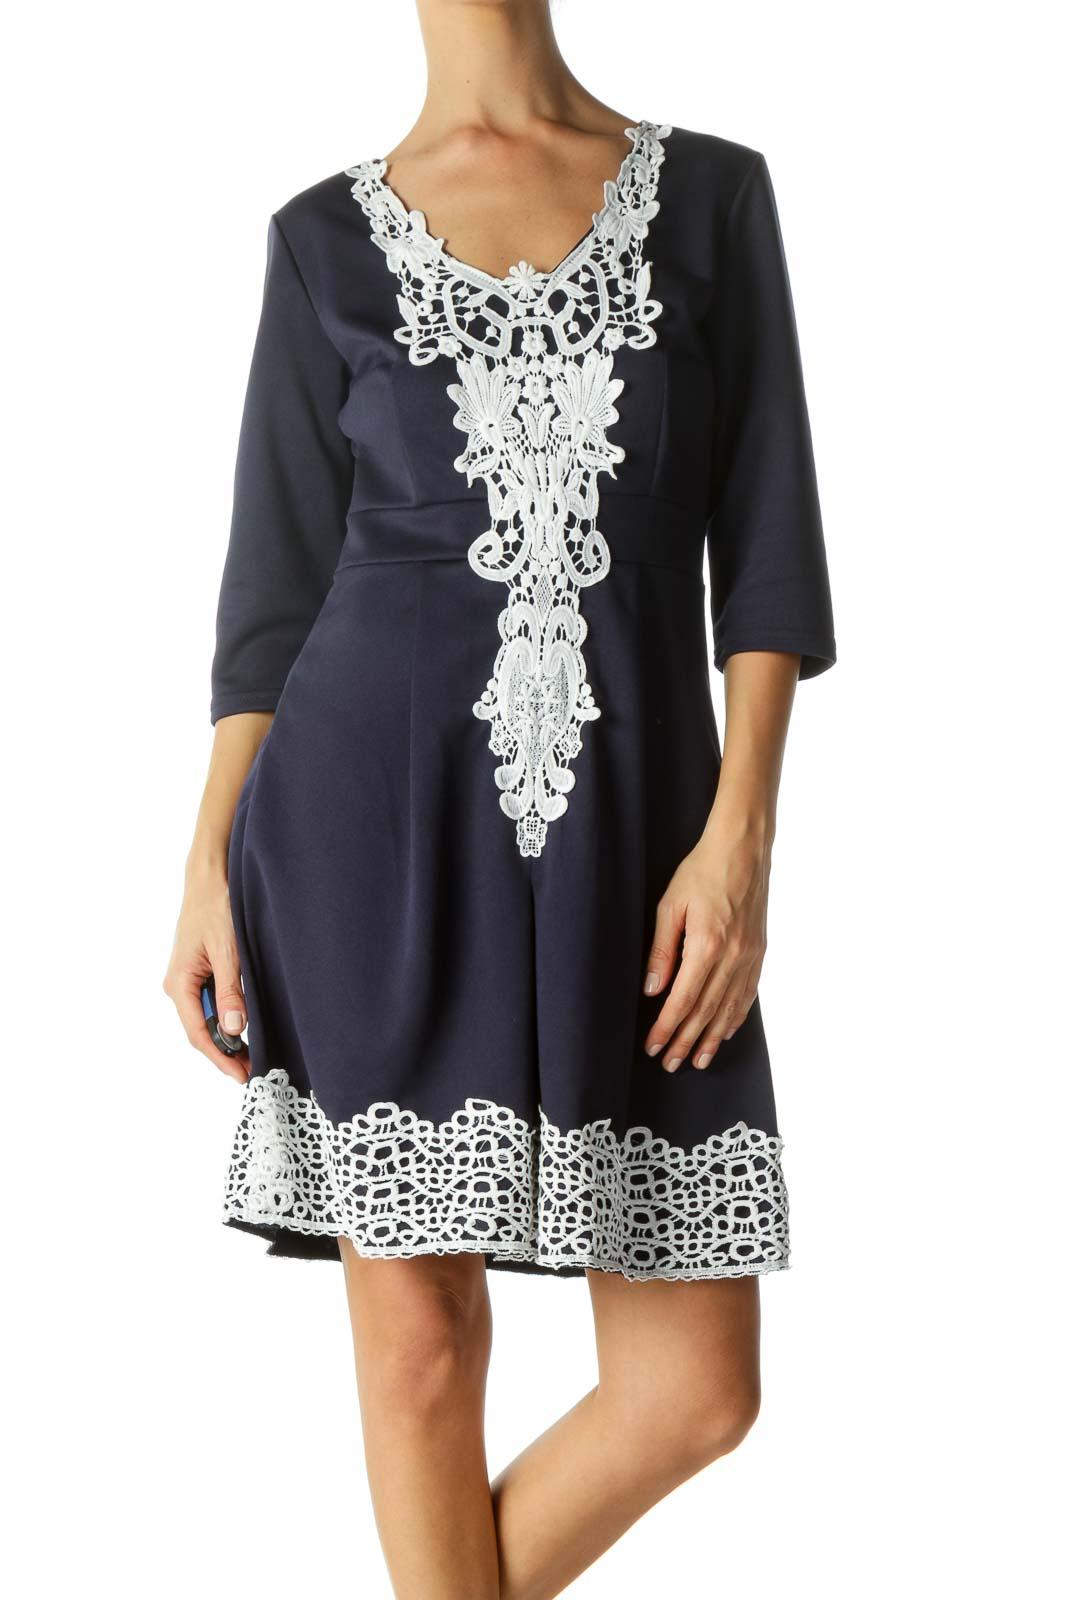 Navy Blue White Lace Trim Detail V-Neck Stretch 3/4 Sleeve Dress